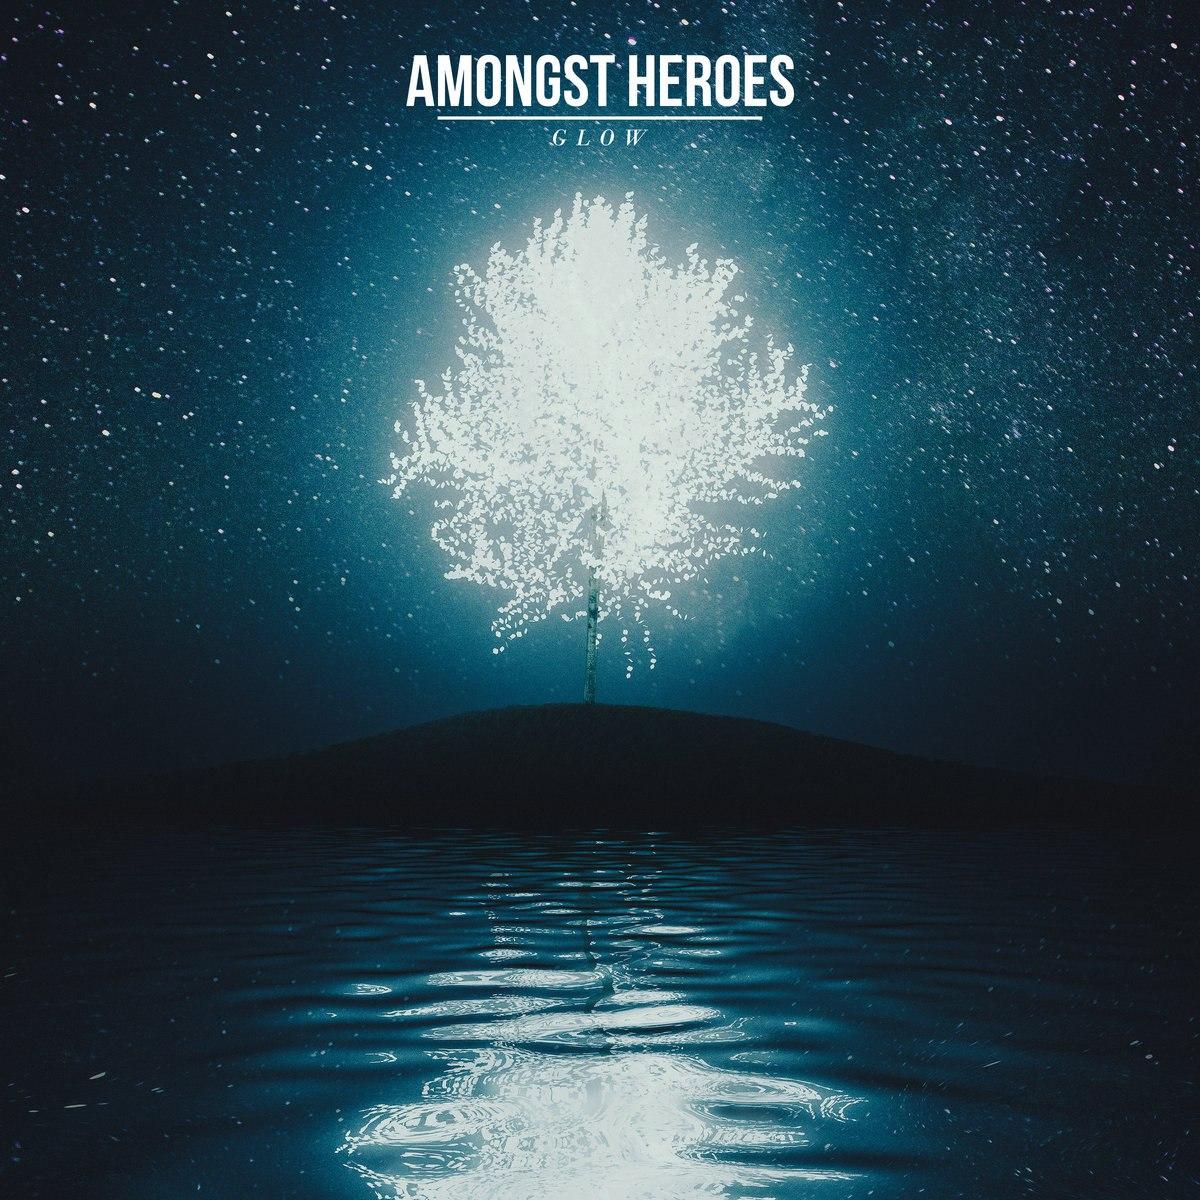 Amongst Heroes - Glow [single] (2015)